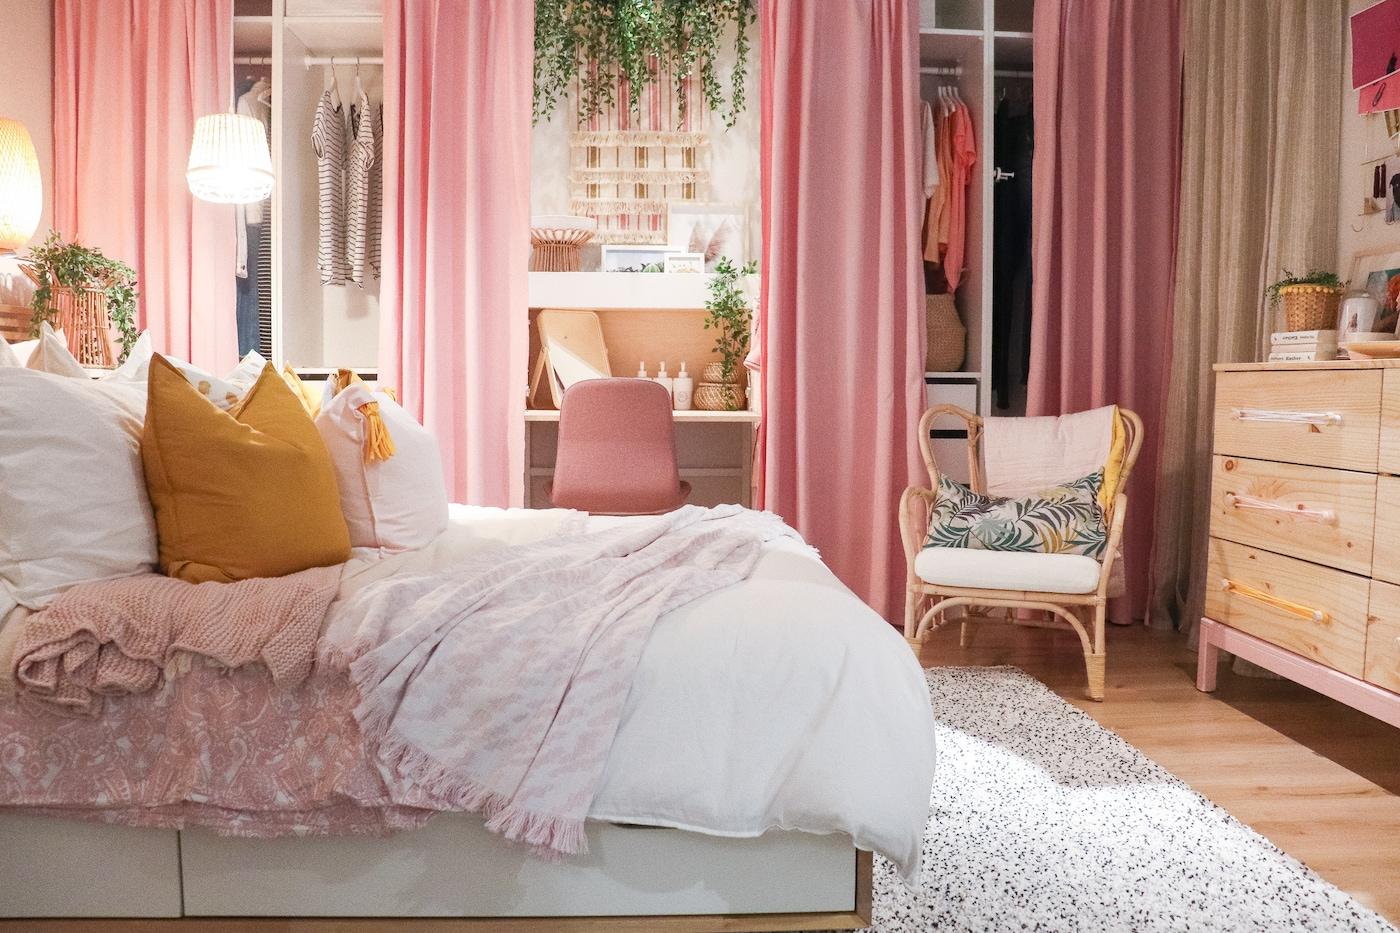 IKEA North Lakes Bedroom 10 - IKEA